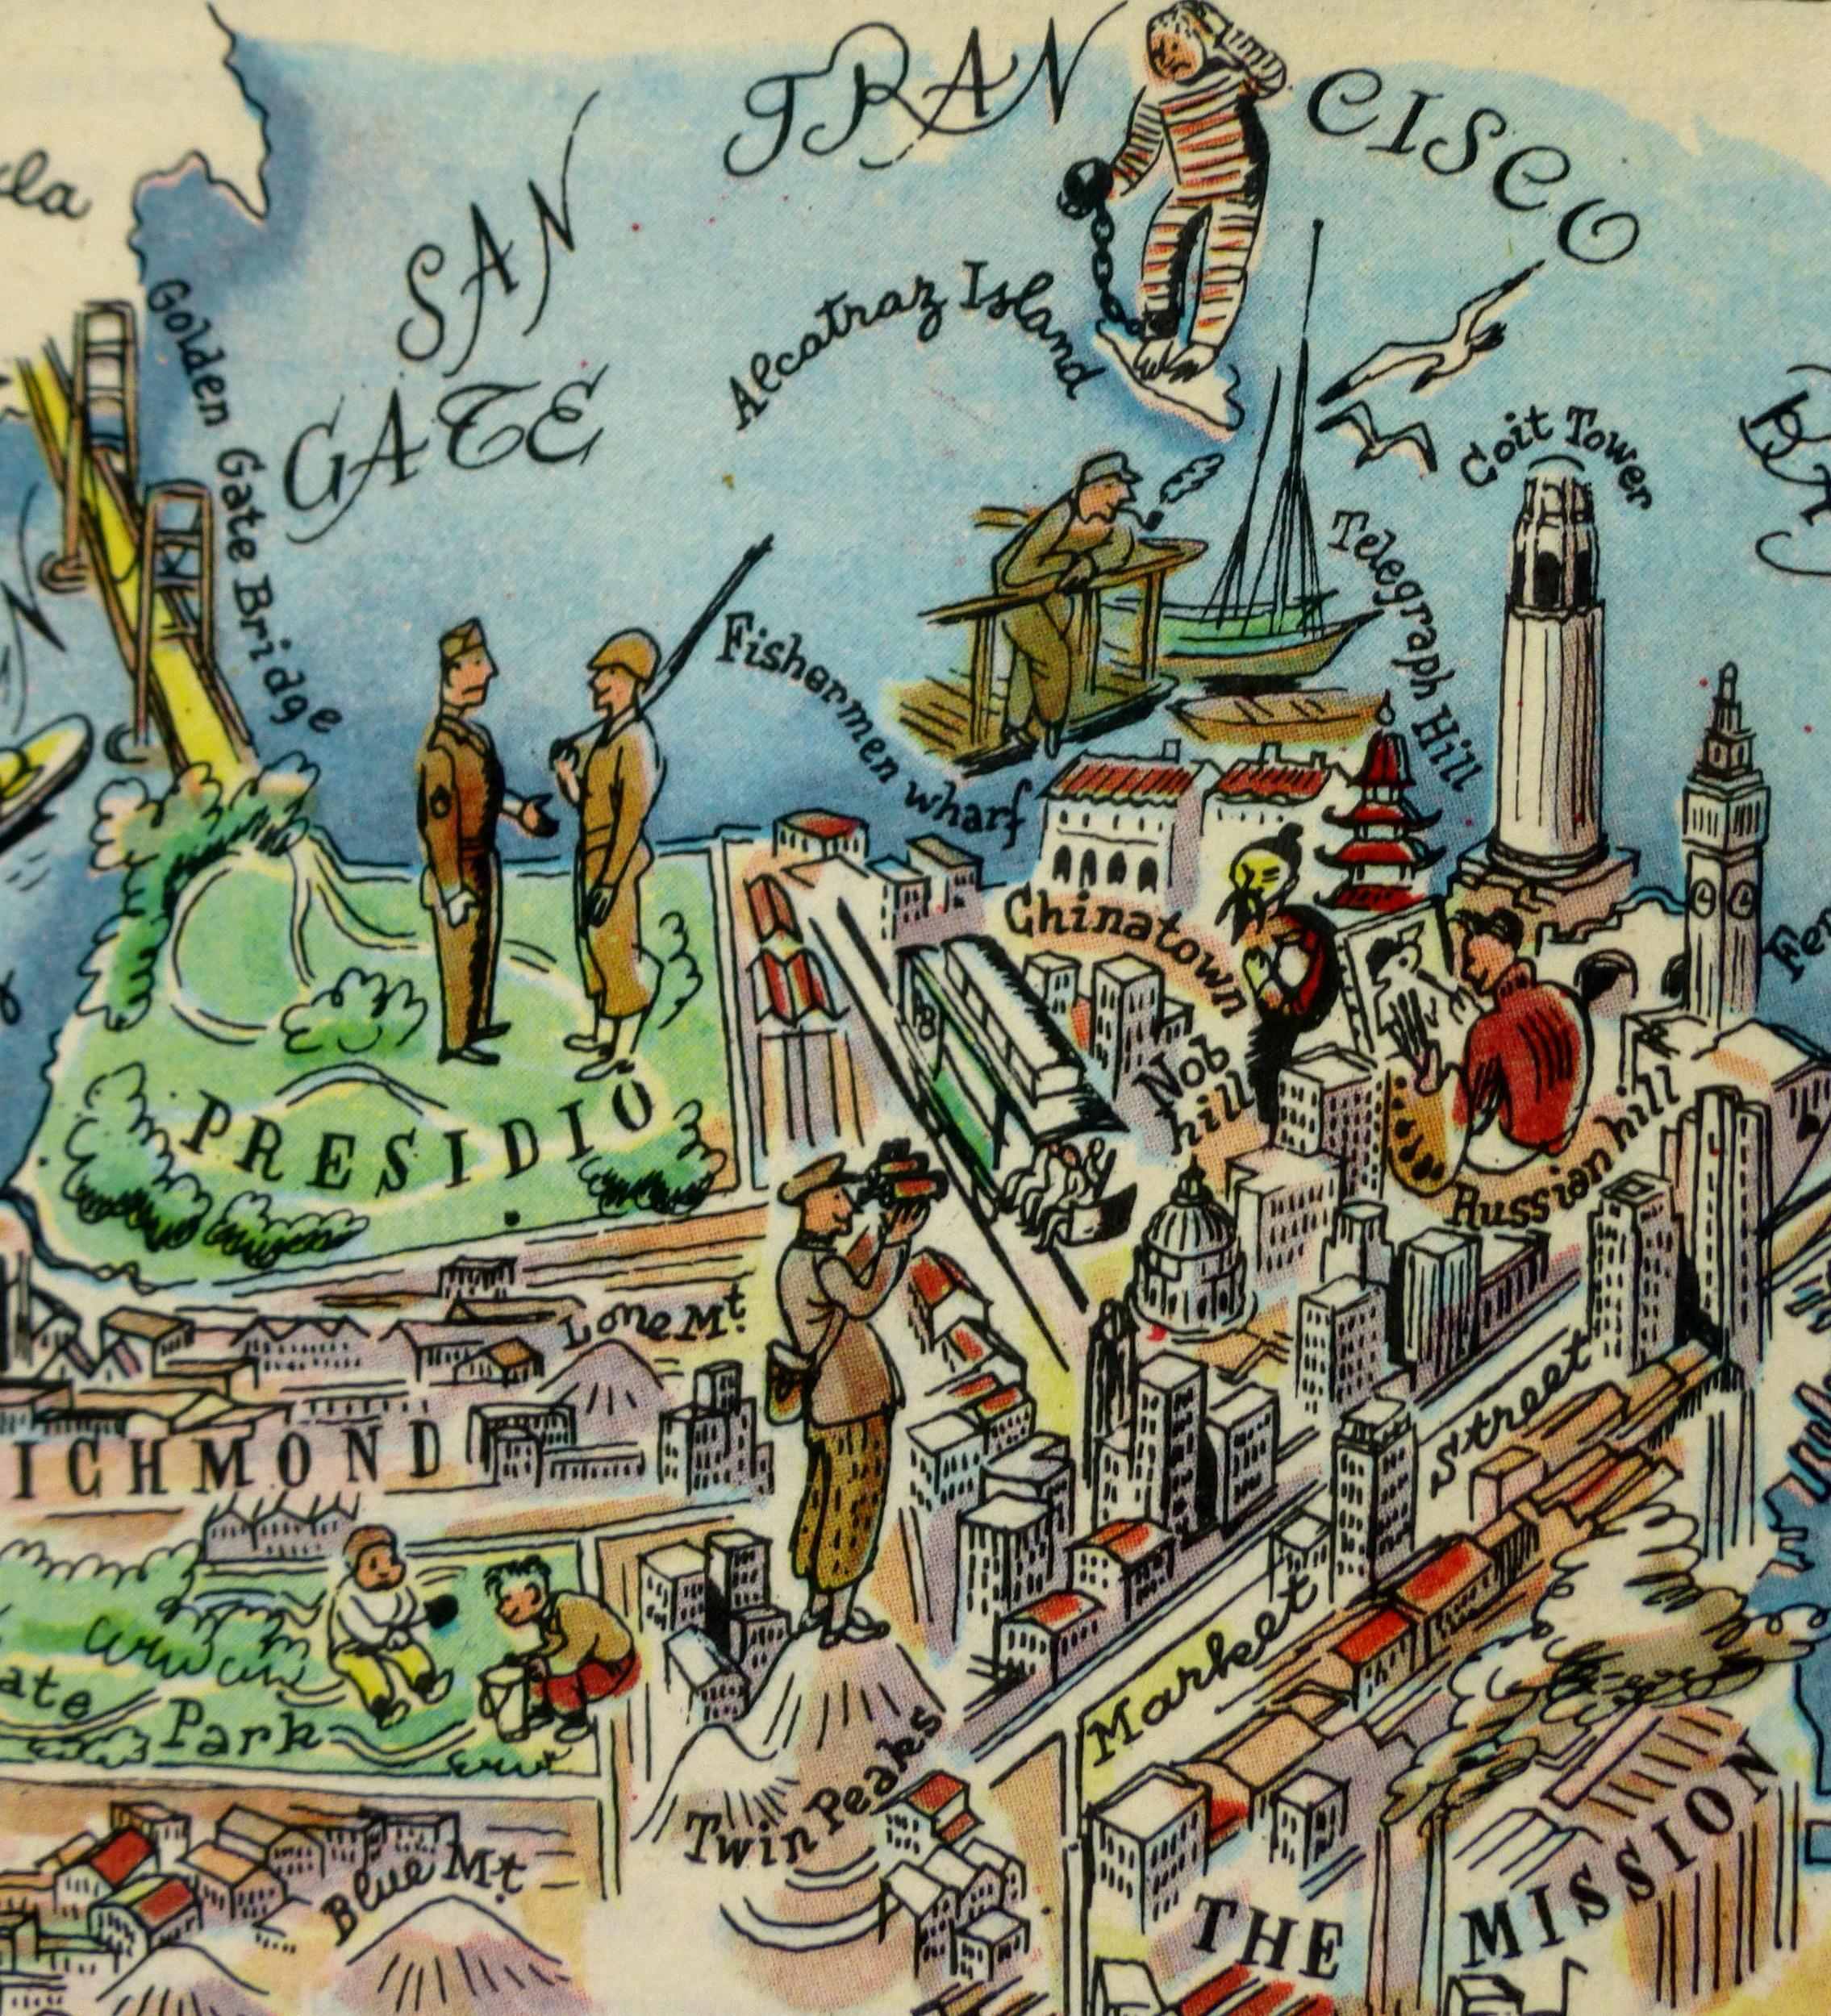 San Francisco Pictorial Map, 1946-detail-6282K